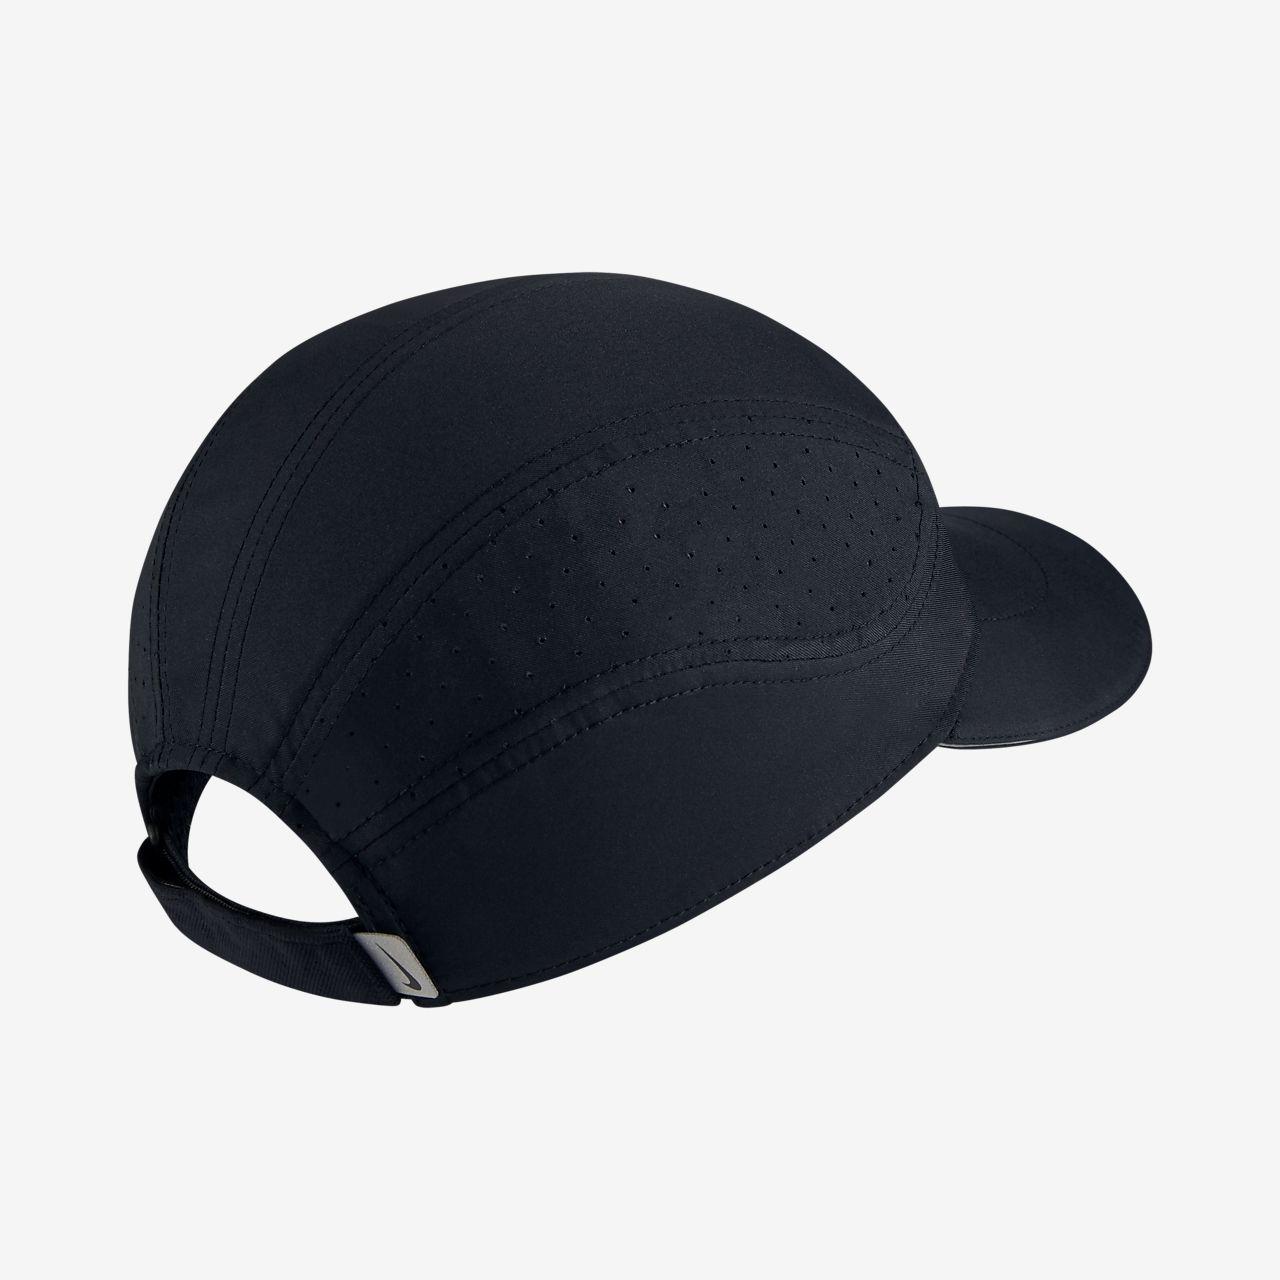 8a9b3ffe64b Low Resolution Nike AeroBill Running Hat Nike AeroBill Running Hat